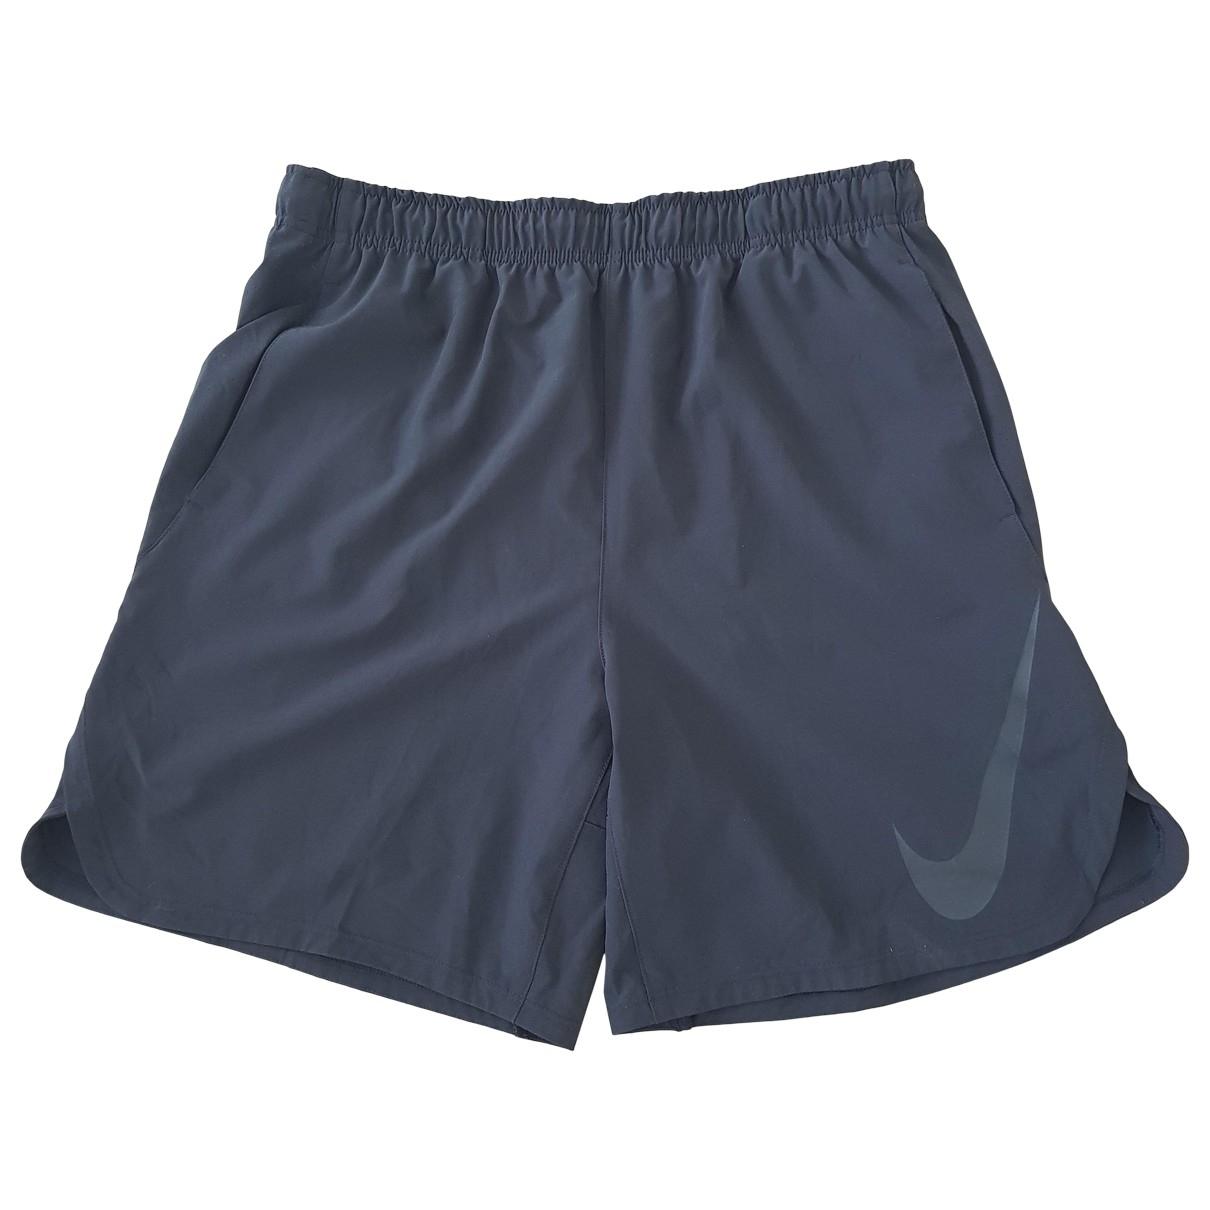 Nike \N Black Shorts for Men XL International